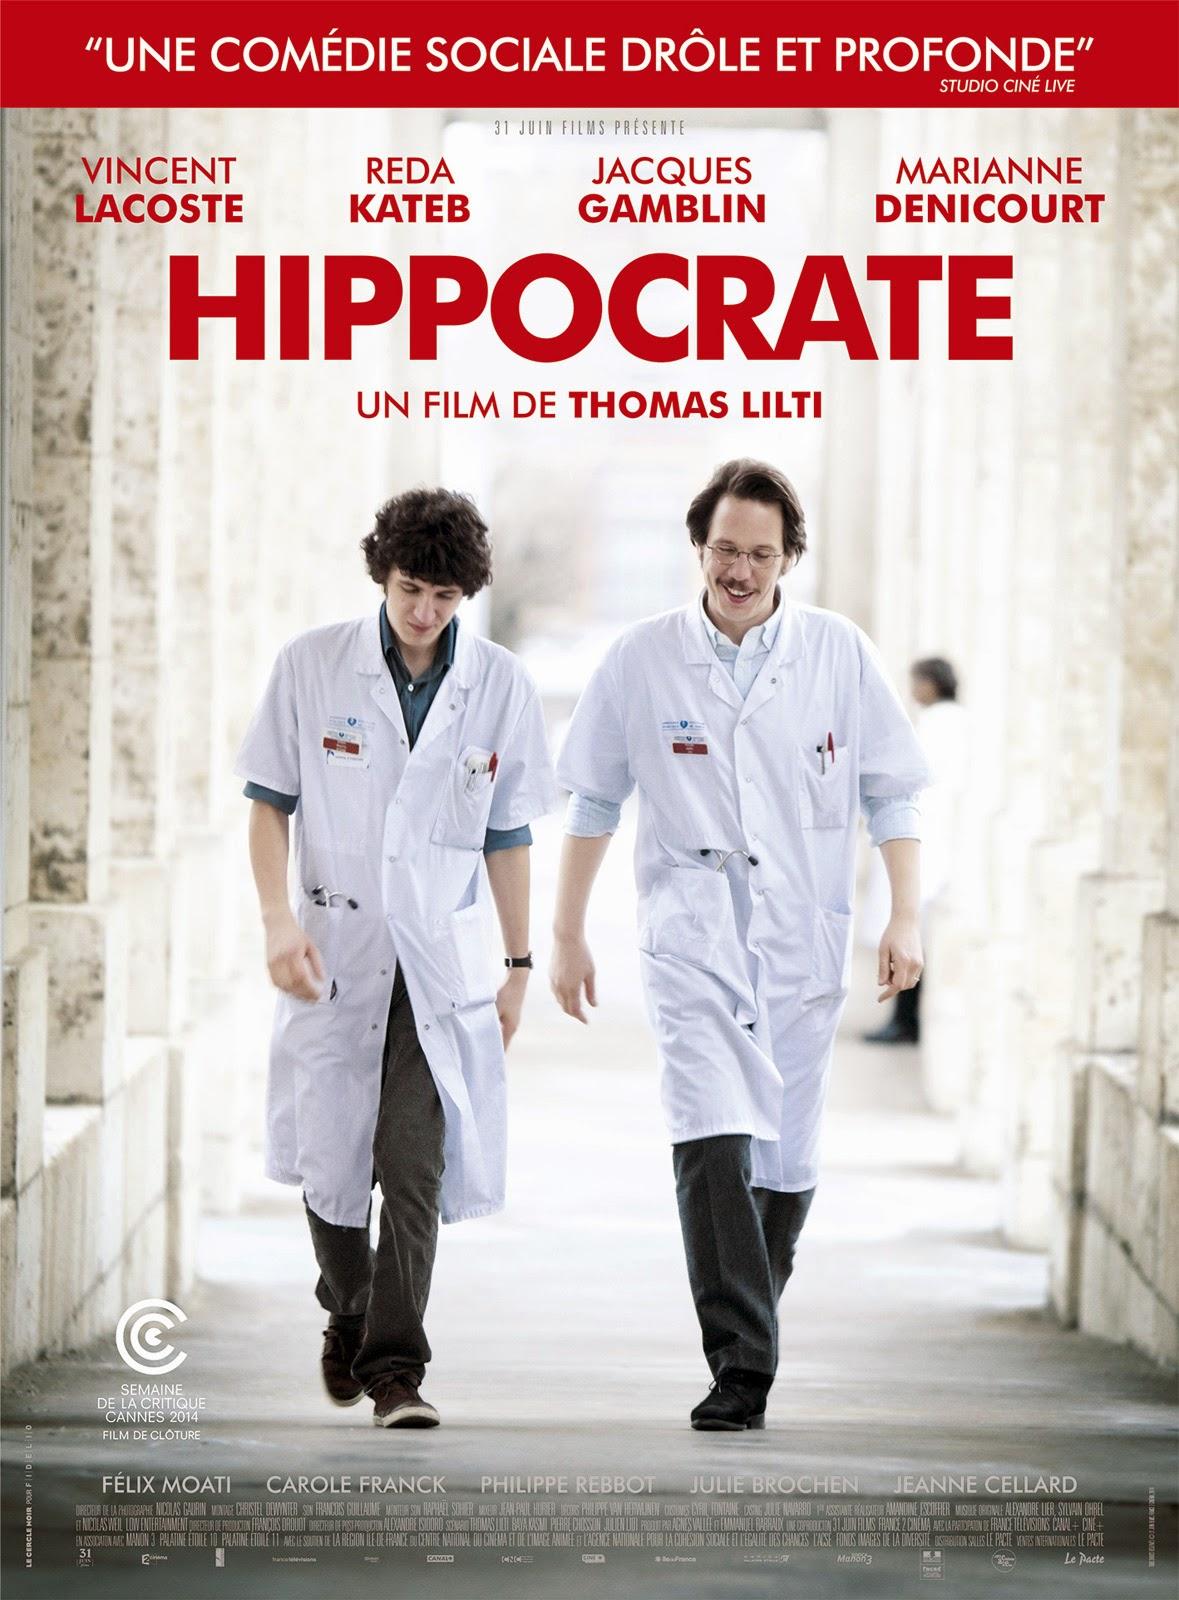 http://fuckingcinephiles.blogspot.fr/2014/09/critique-hippocrate.html